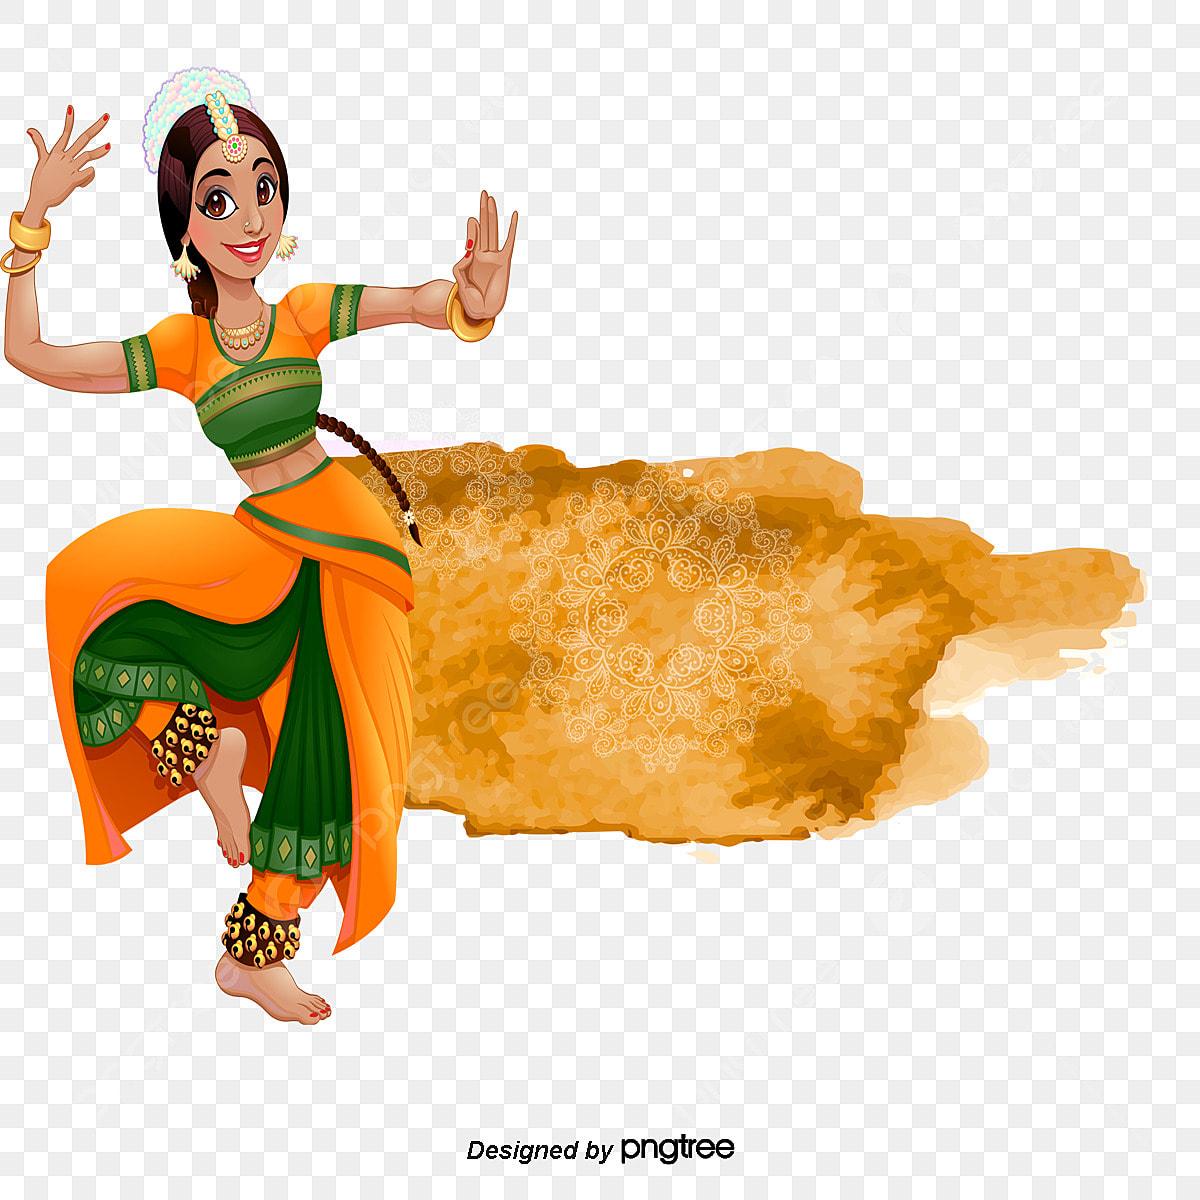 Indian Dancing Clip Art Kids   Dancers of India by Dancing Crayon Designs